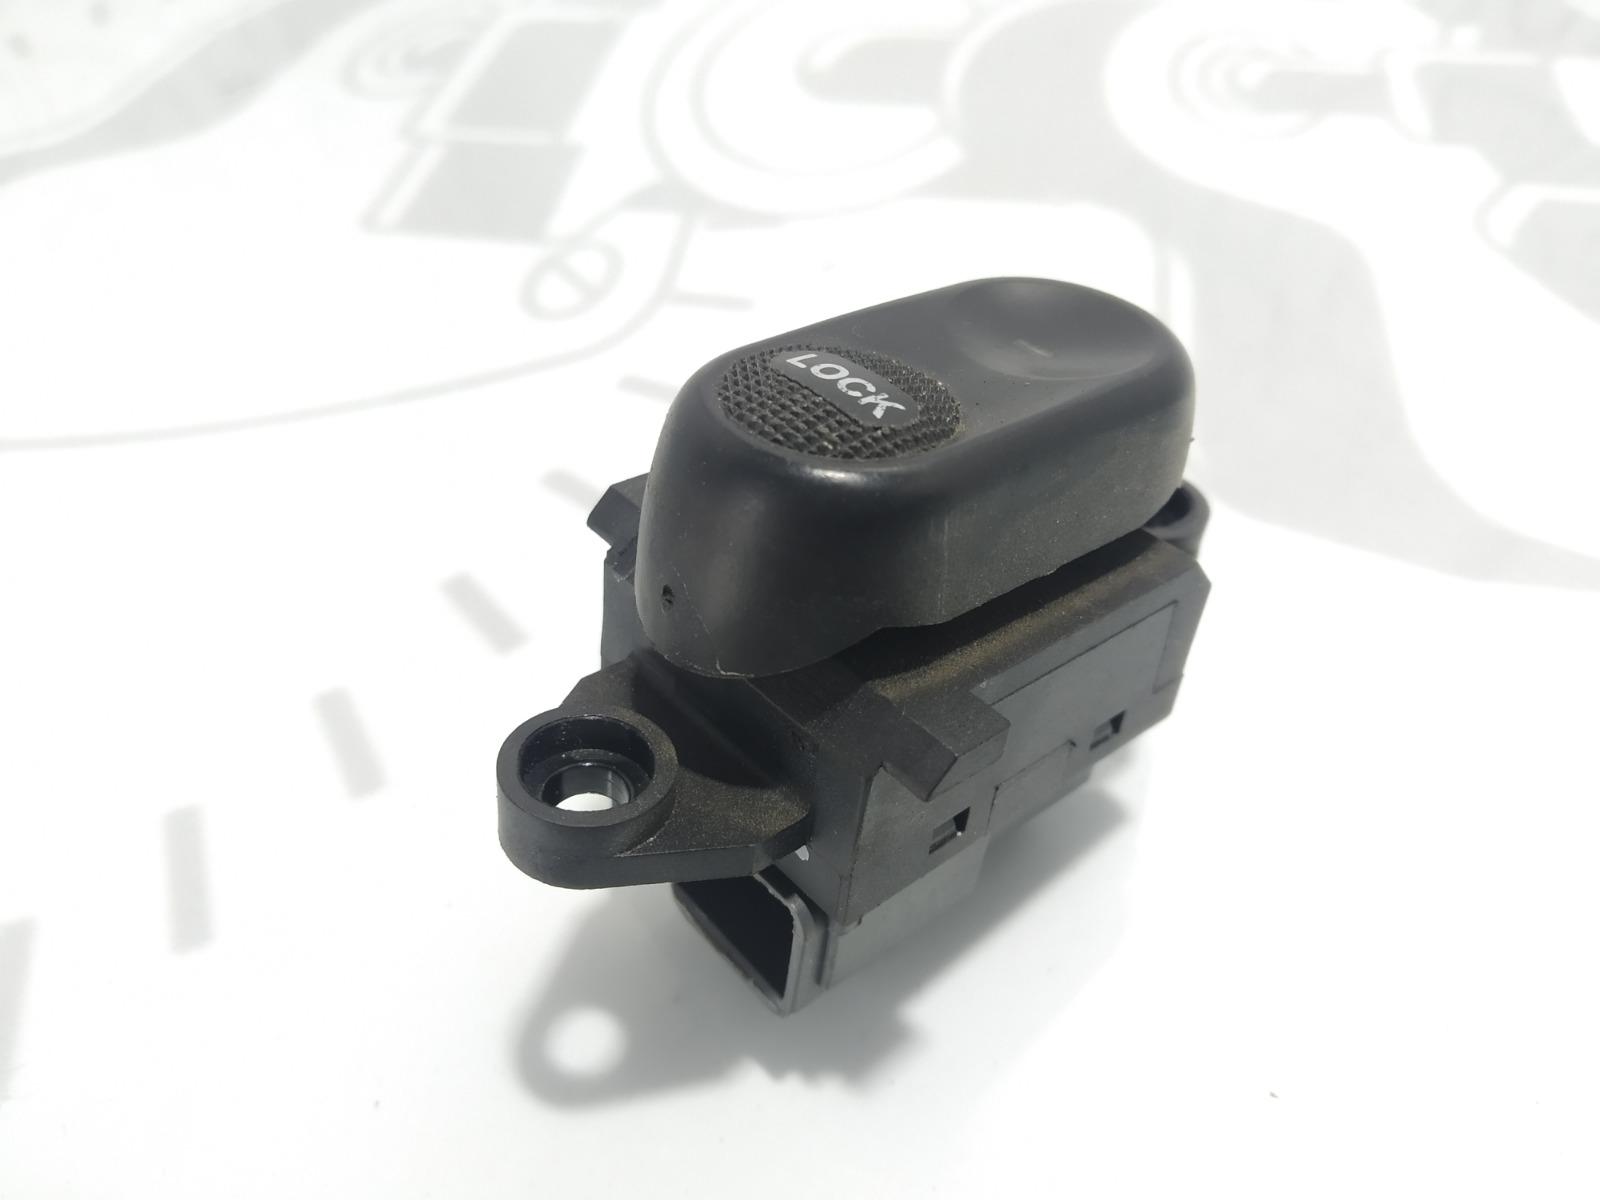 Кнопка центрального замка Chrysler Pt-Cruiser 2.0 I 2003 (б/у)